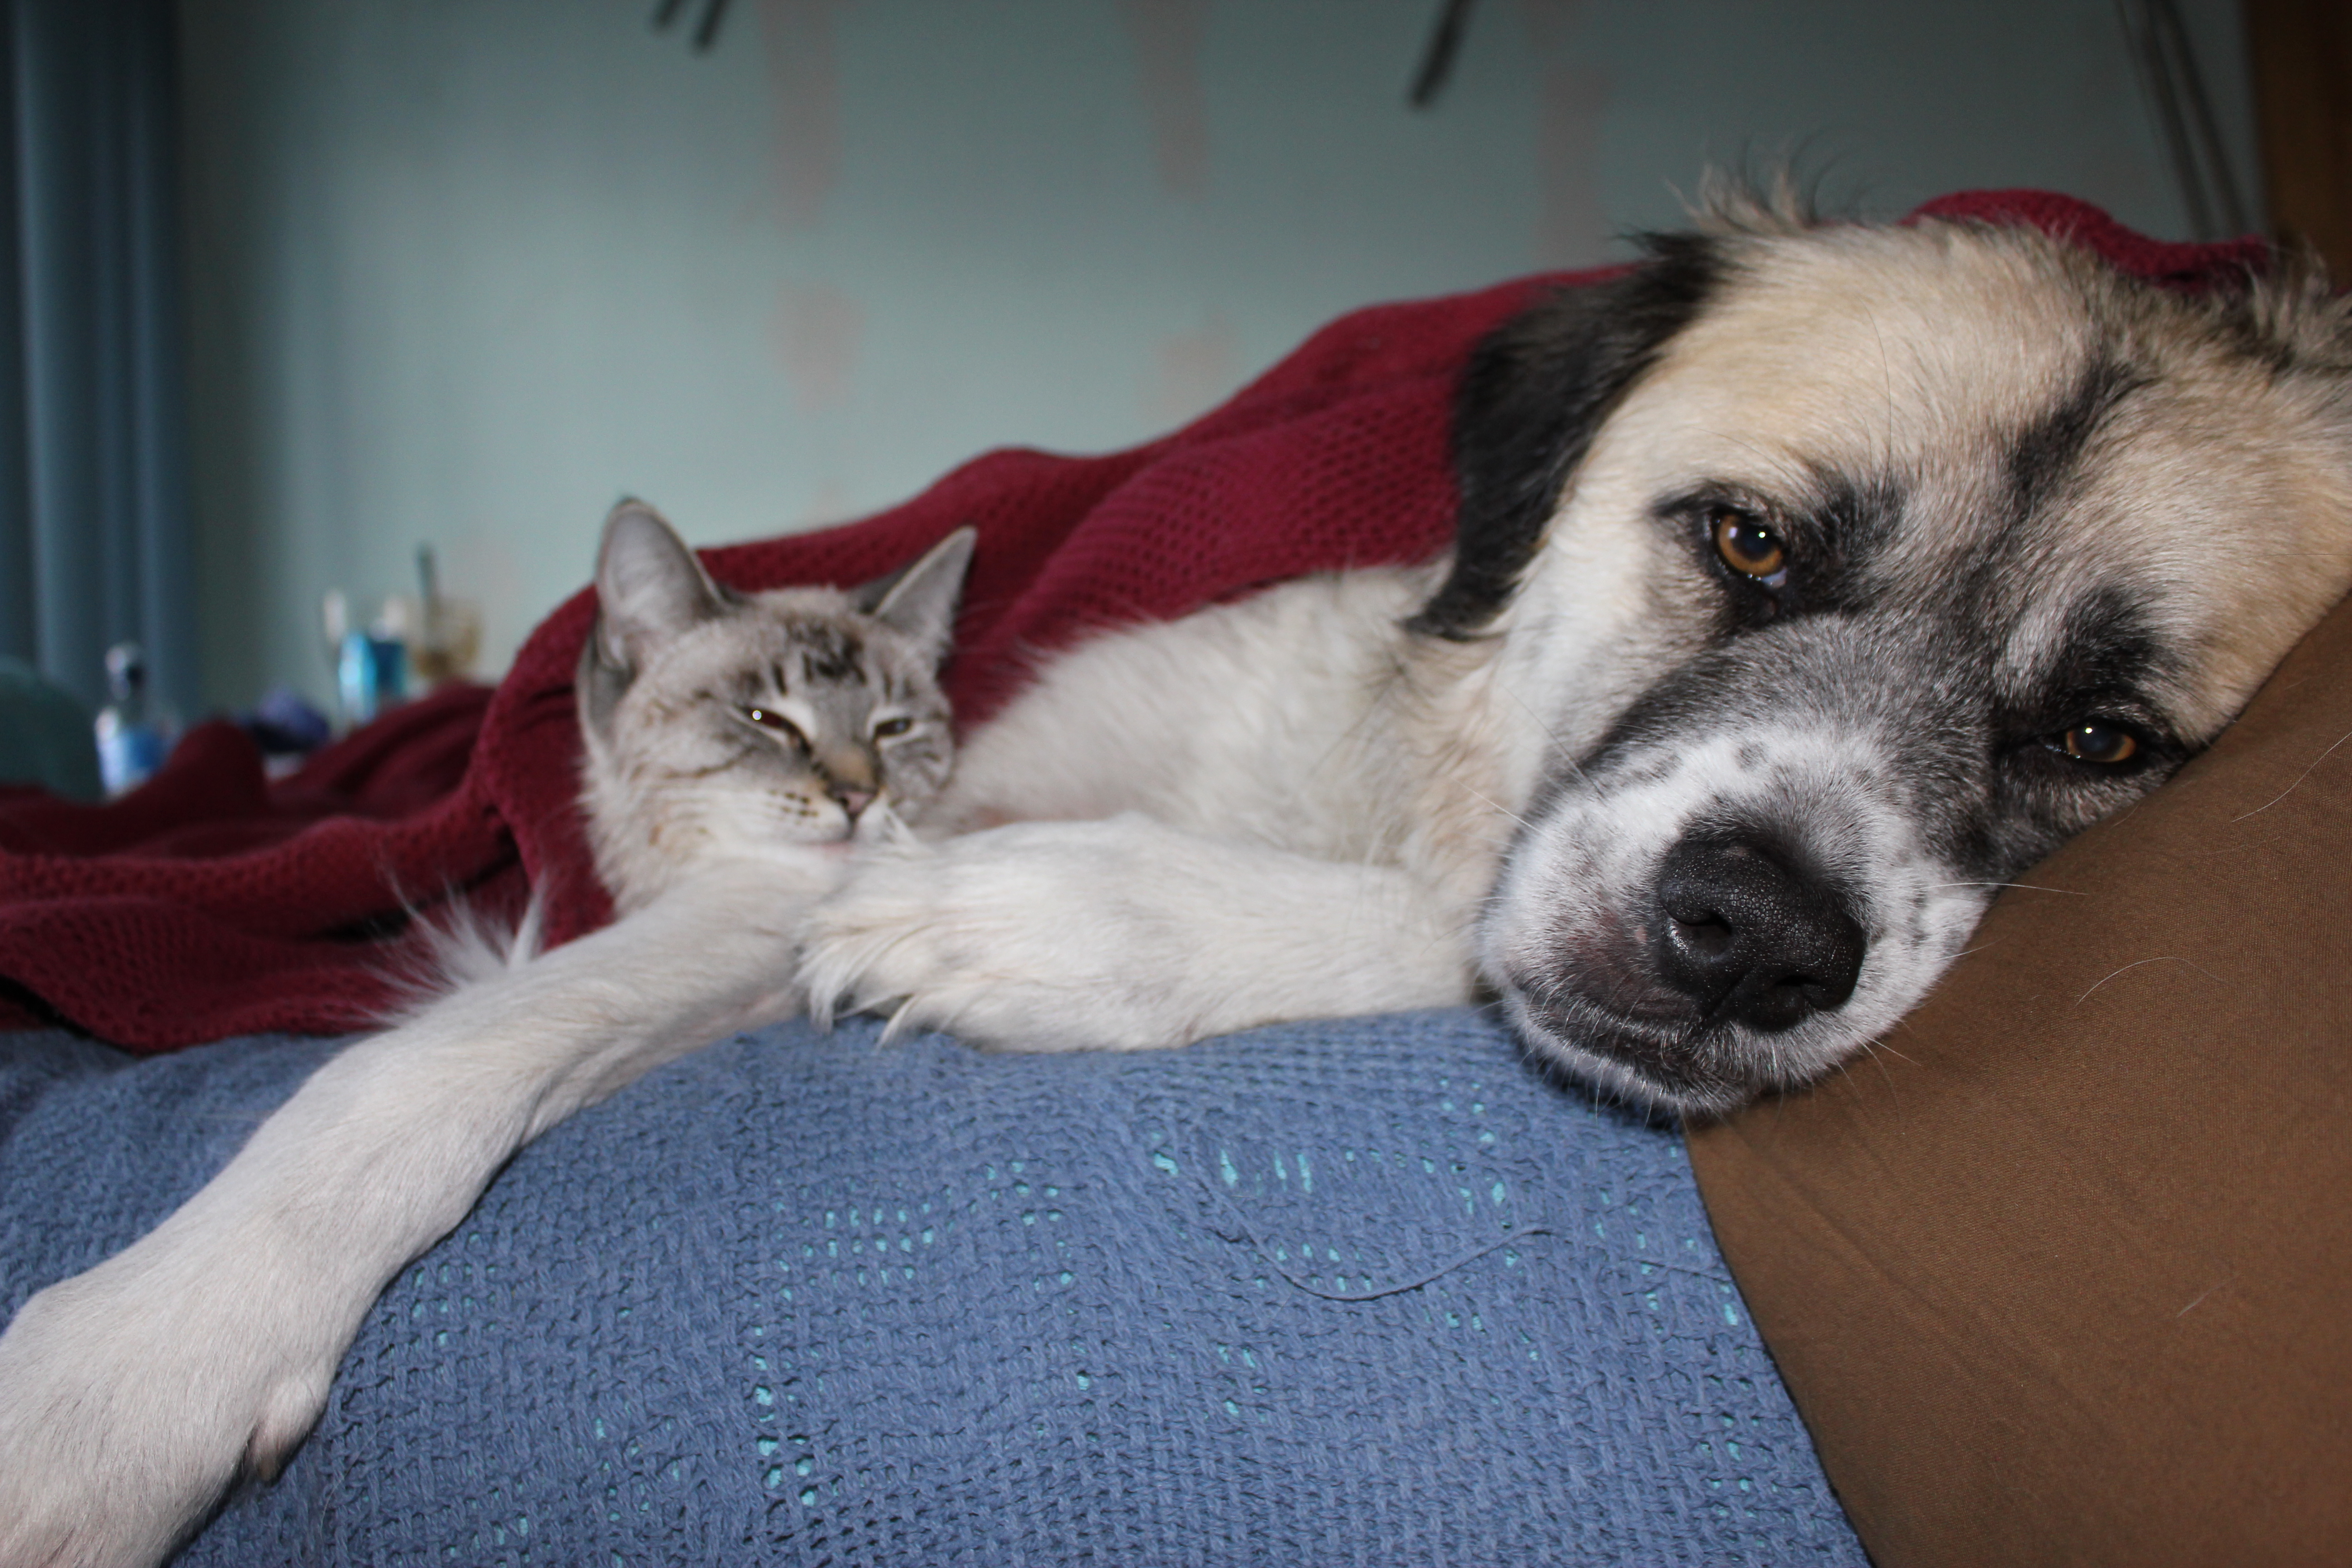 Herman and Aqua cuddle after bath